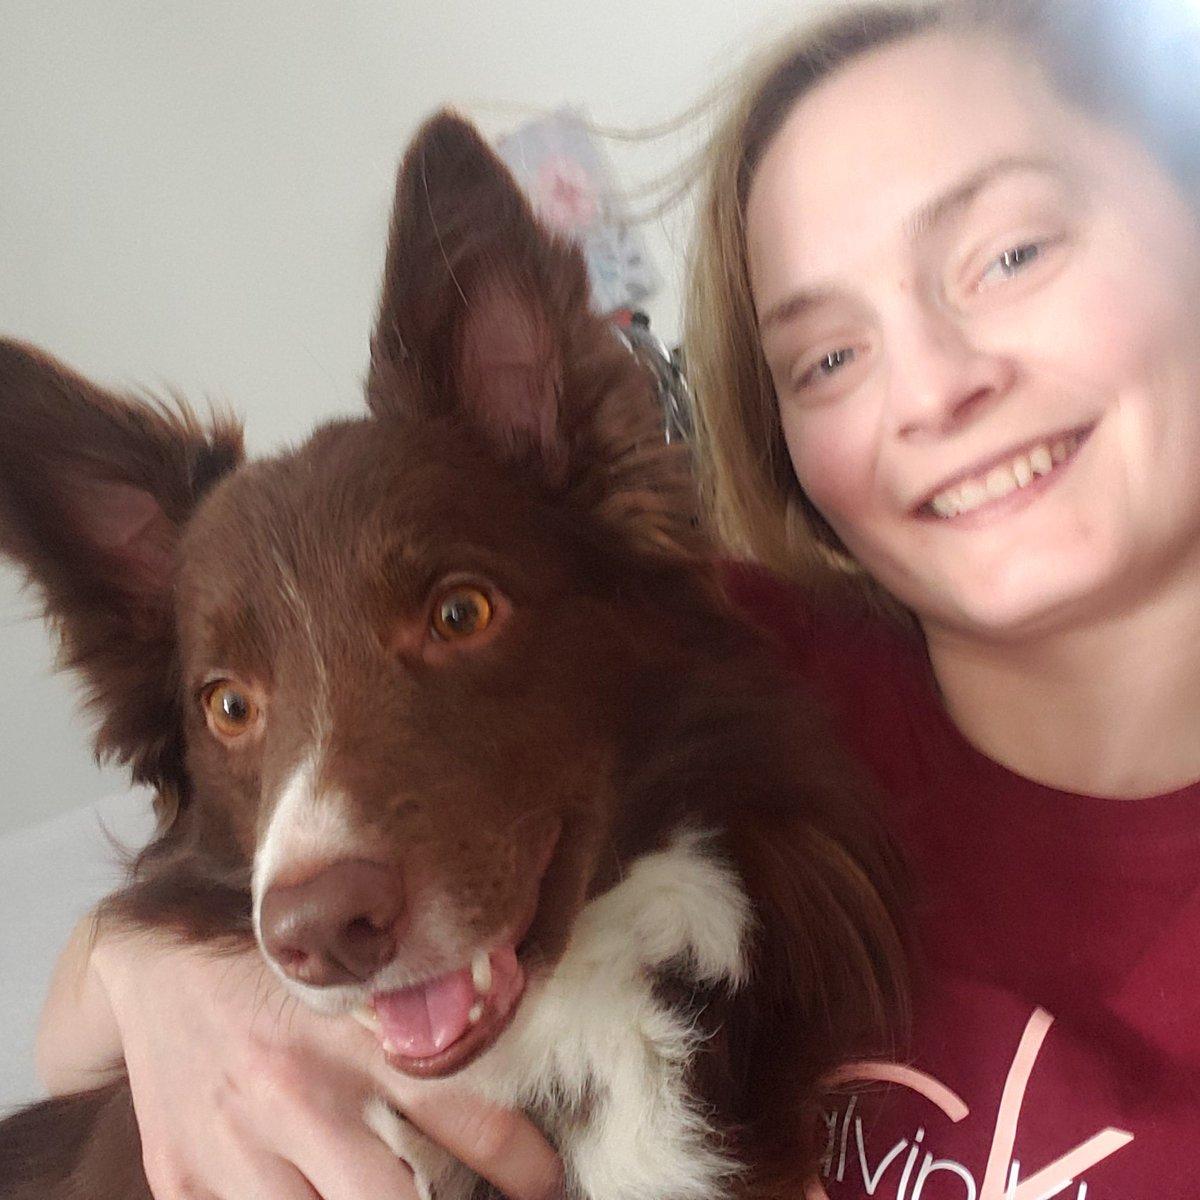 #love my Winnie boy #dog #dogs #dogphoto #dogselfie #bordercollie #bordercolliesnuggles #bordercolliephotos #bordercollielove #bordercollielovers #reddog #dogsarelove #dogsarefamily #dogcuddle #doglooks #dogsmile #dogsmileselfie #smilingdog #bordercolliephoto @CalvinKleinpic.twitter.com/qc5HO4evFT